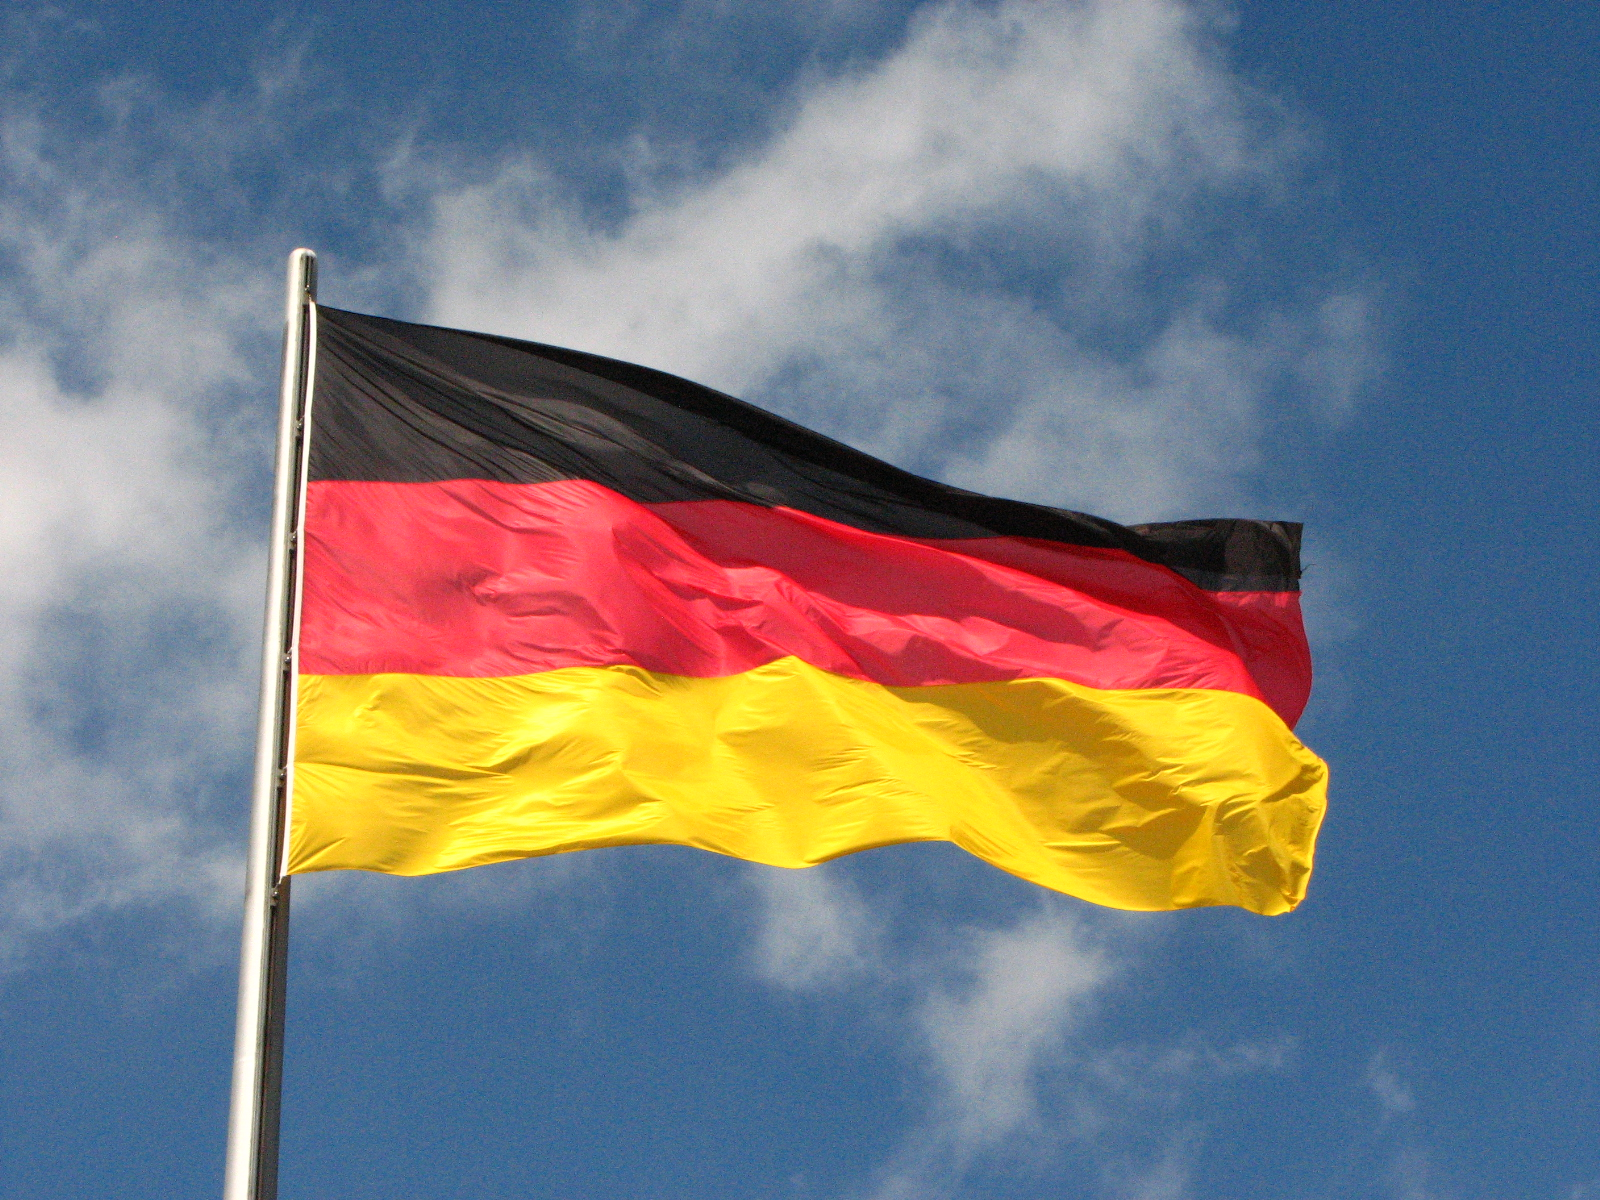 German Flag 1 Нино Джавахадзе Нино Джавахадзе